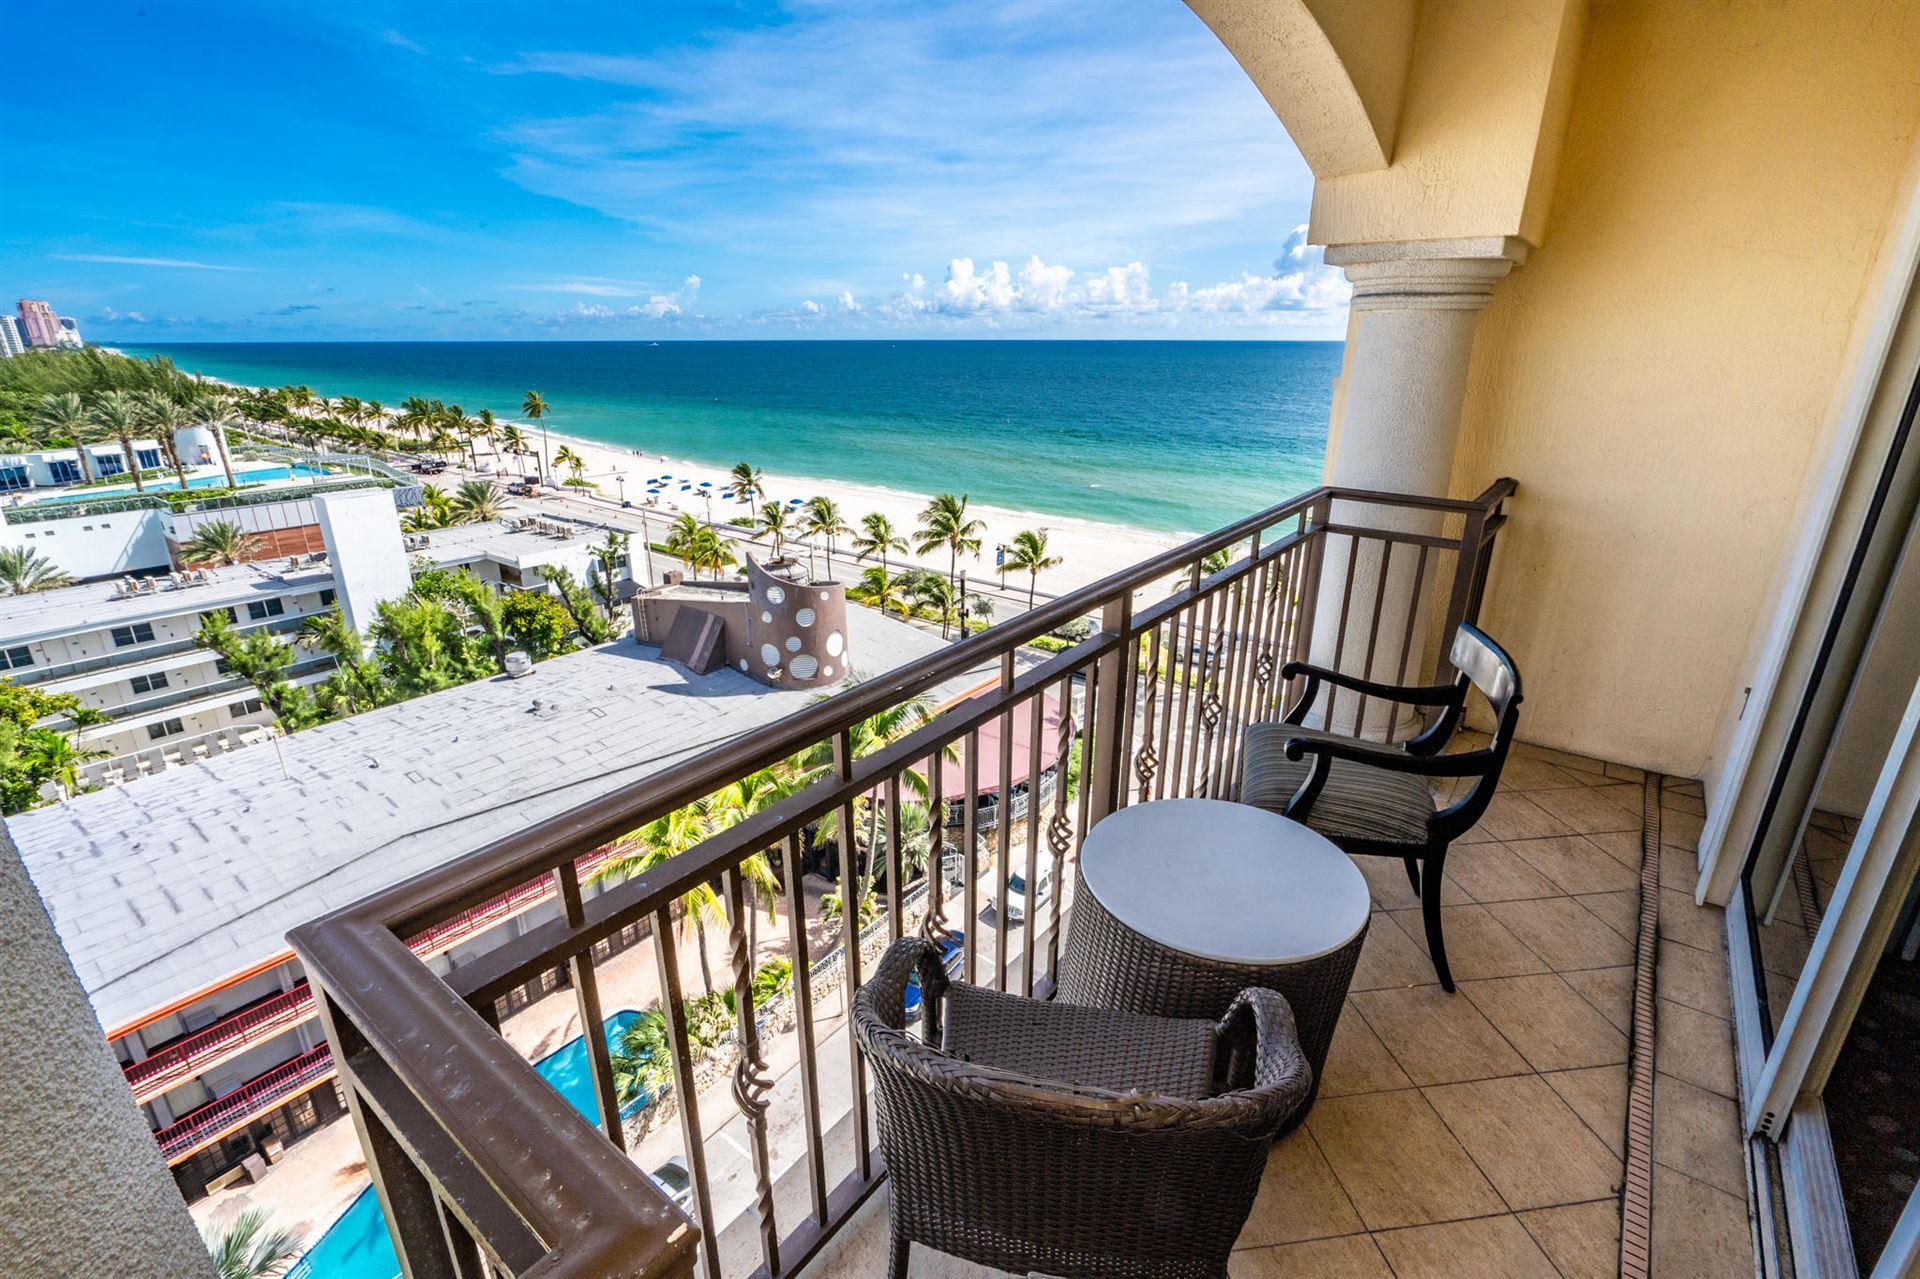 601 N Fort Lauderdale Beach Boulevard #811, Fort Lauderdale, FL 33304 - #: RX-10657260